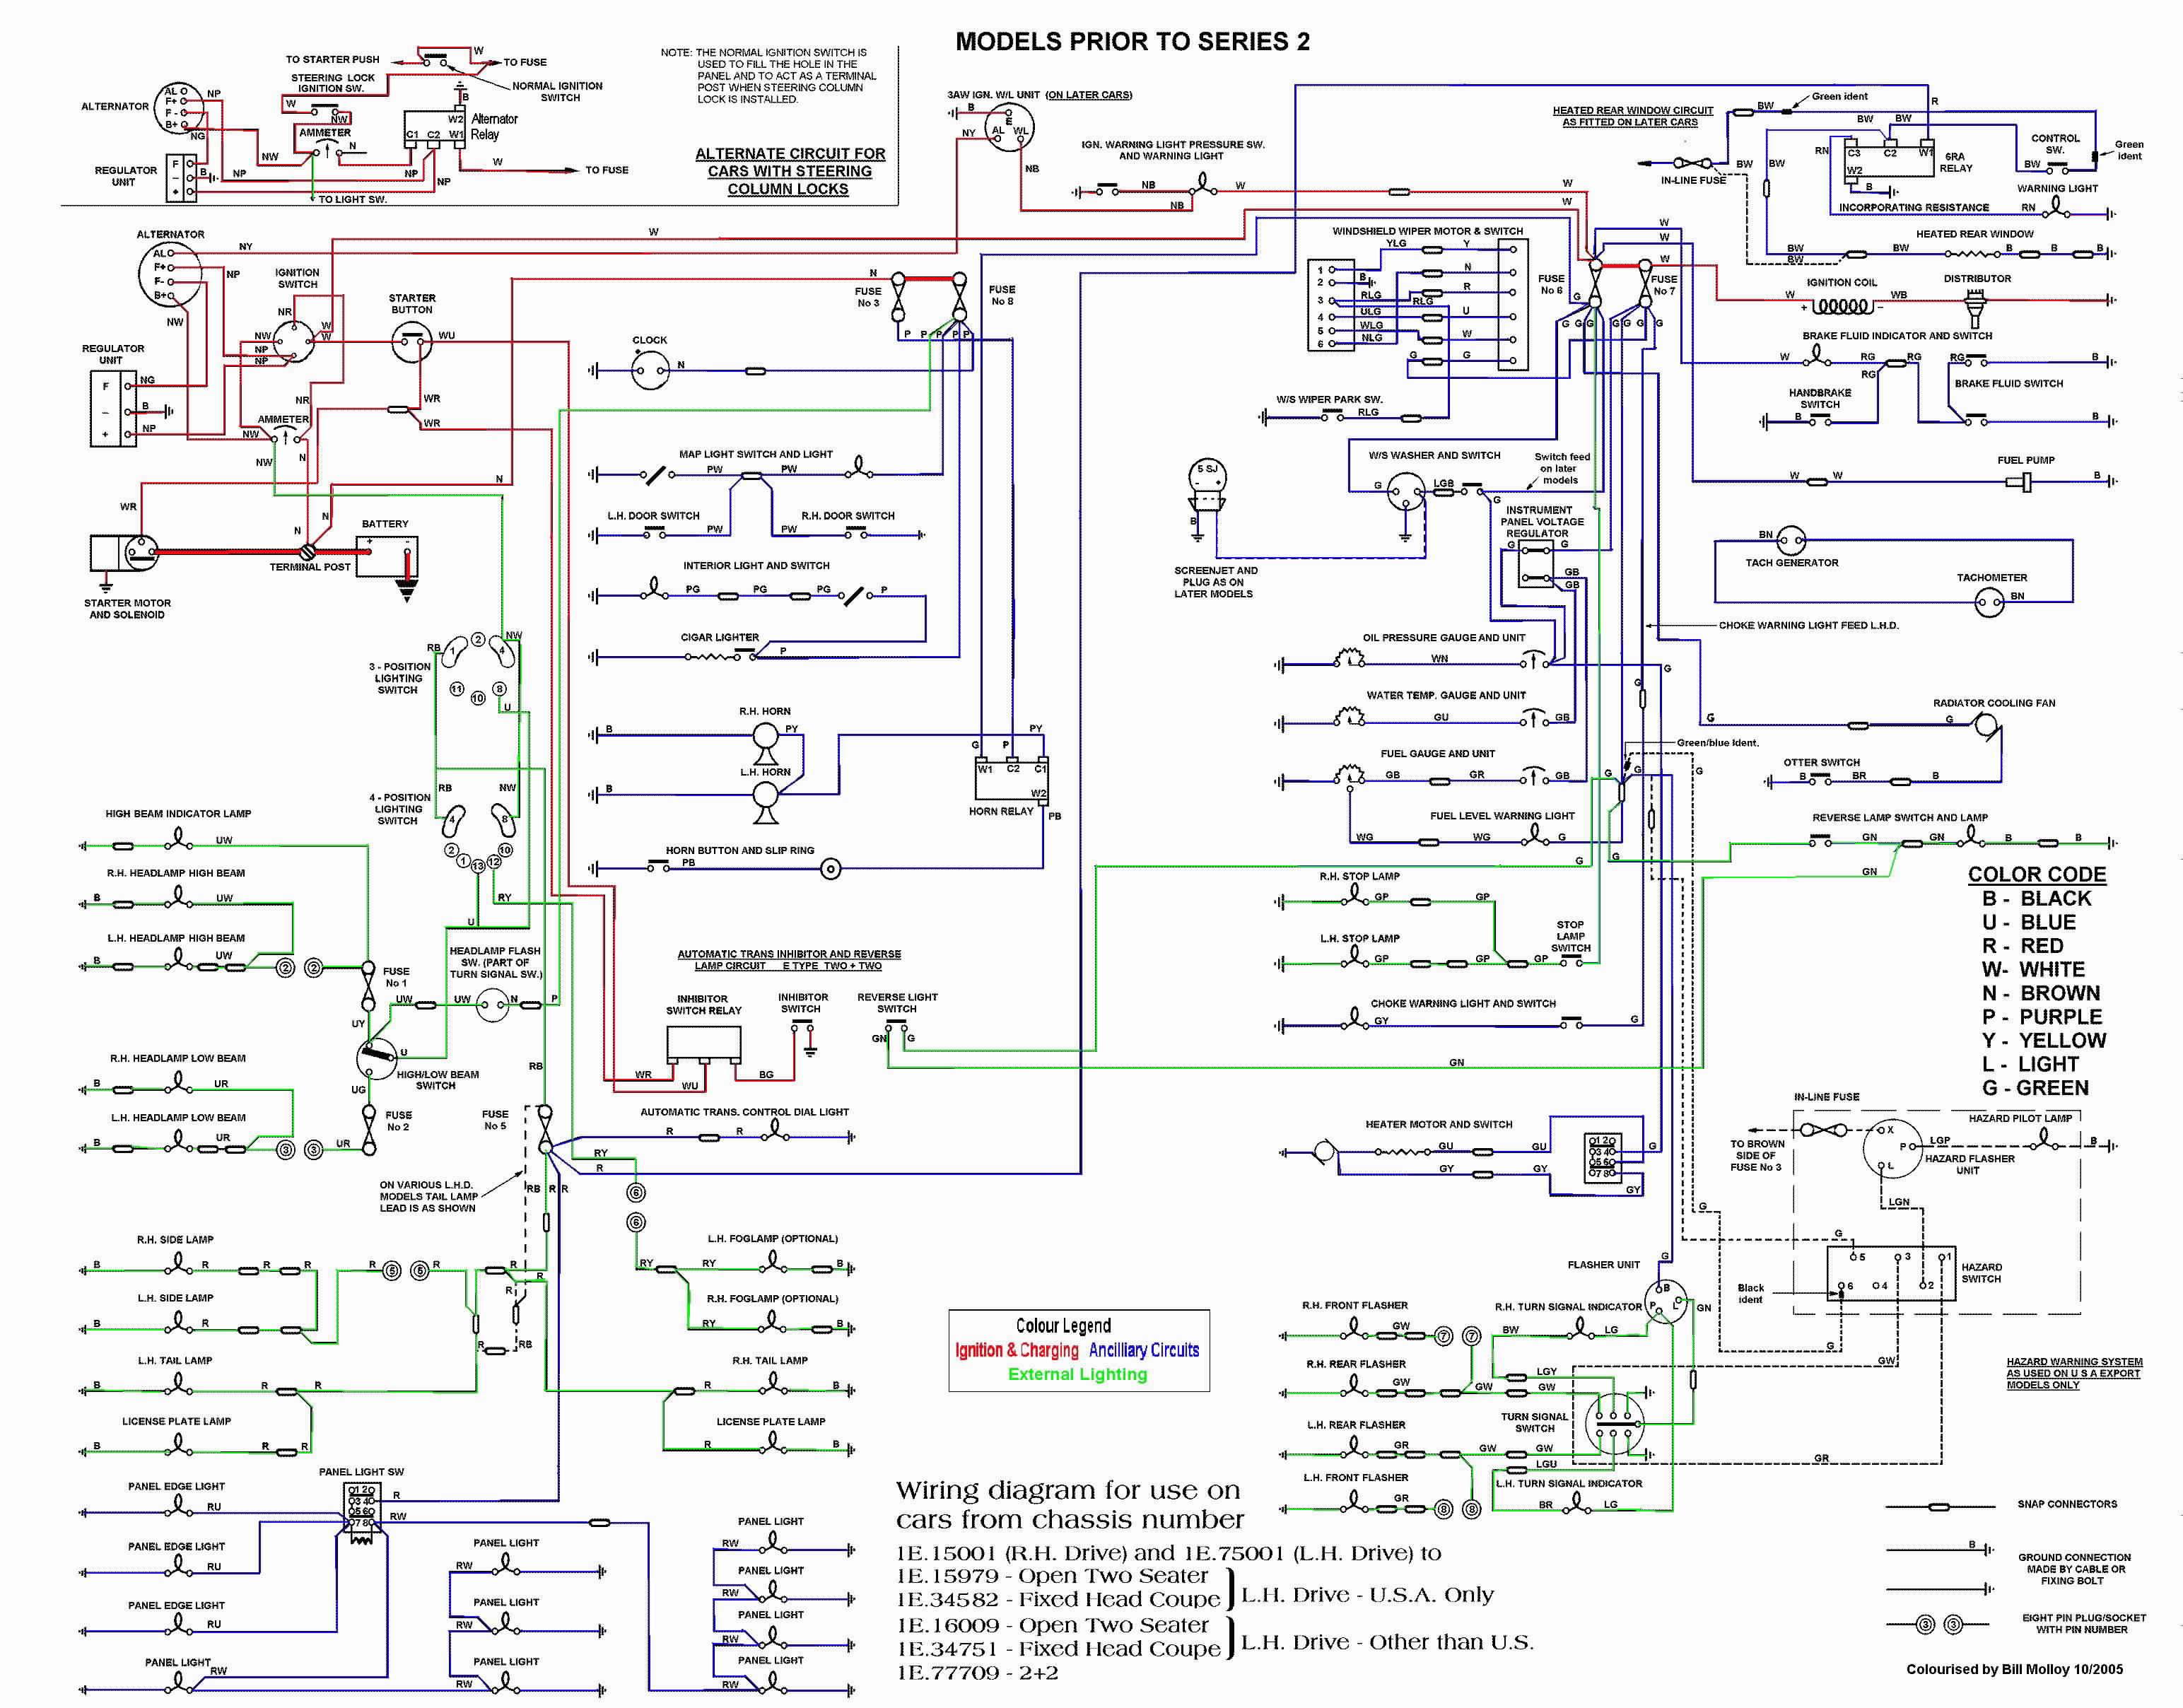 Diagram In Pictures Database 2000 Jaguar S Type Wiring Diagram Just Download Or Read Wiring Diagram S Nelson Wiring Onyxum Com